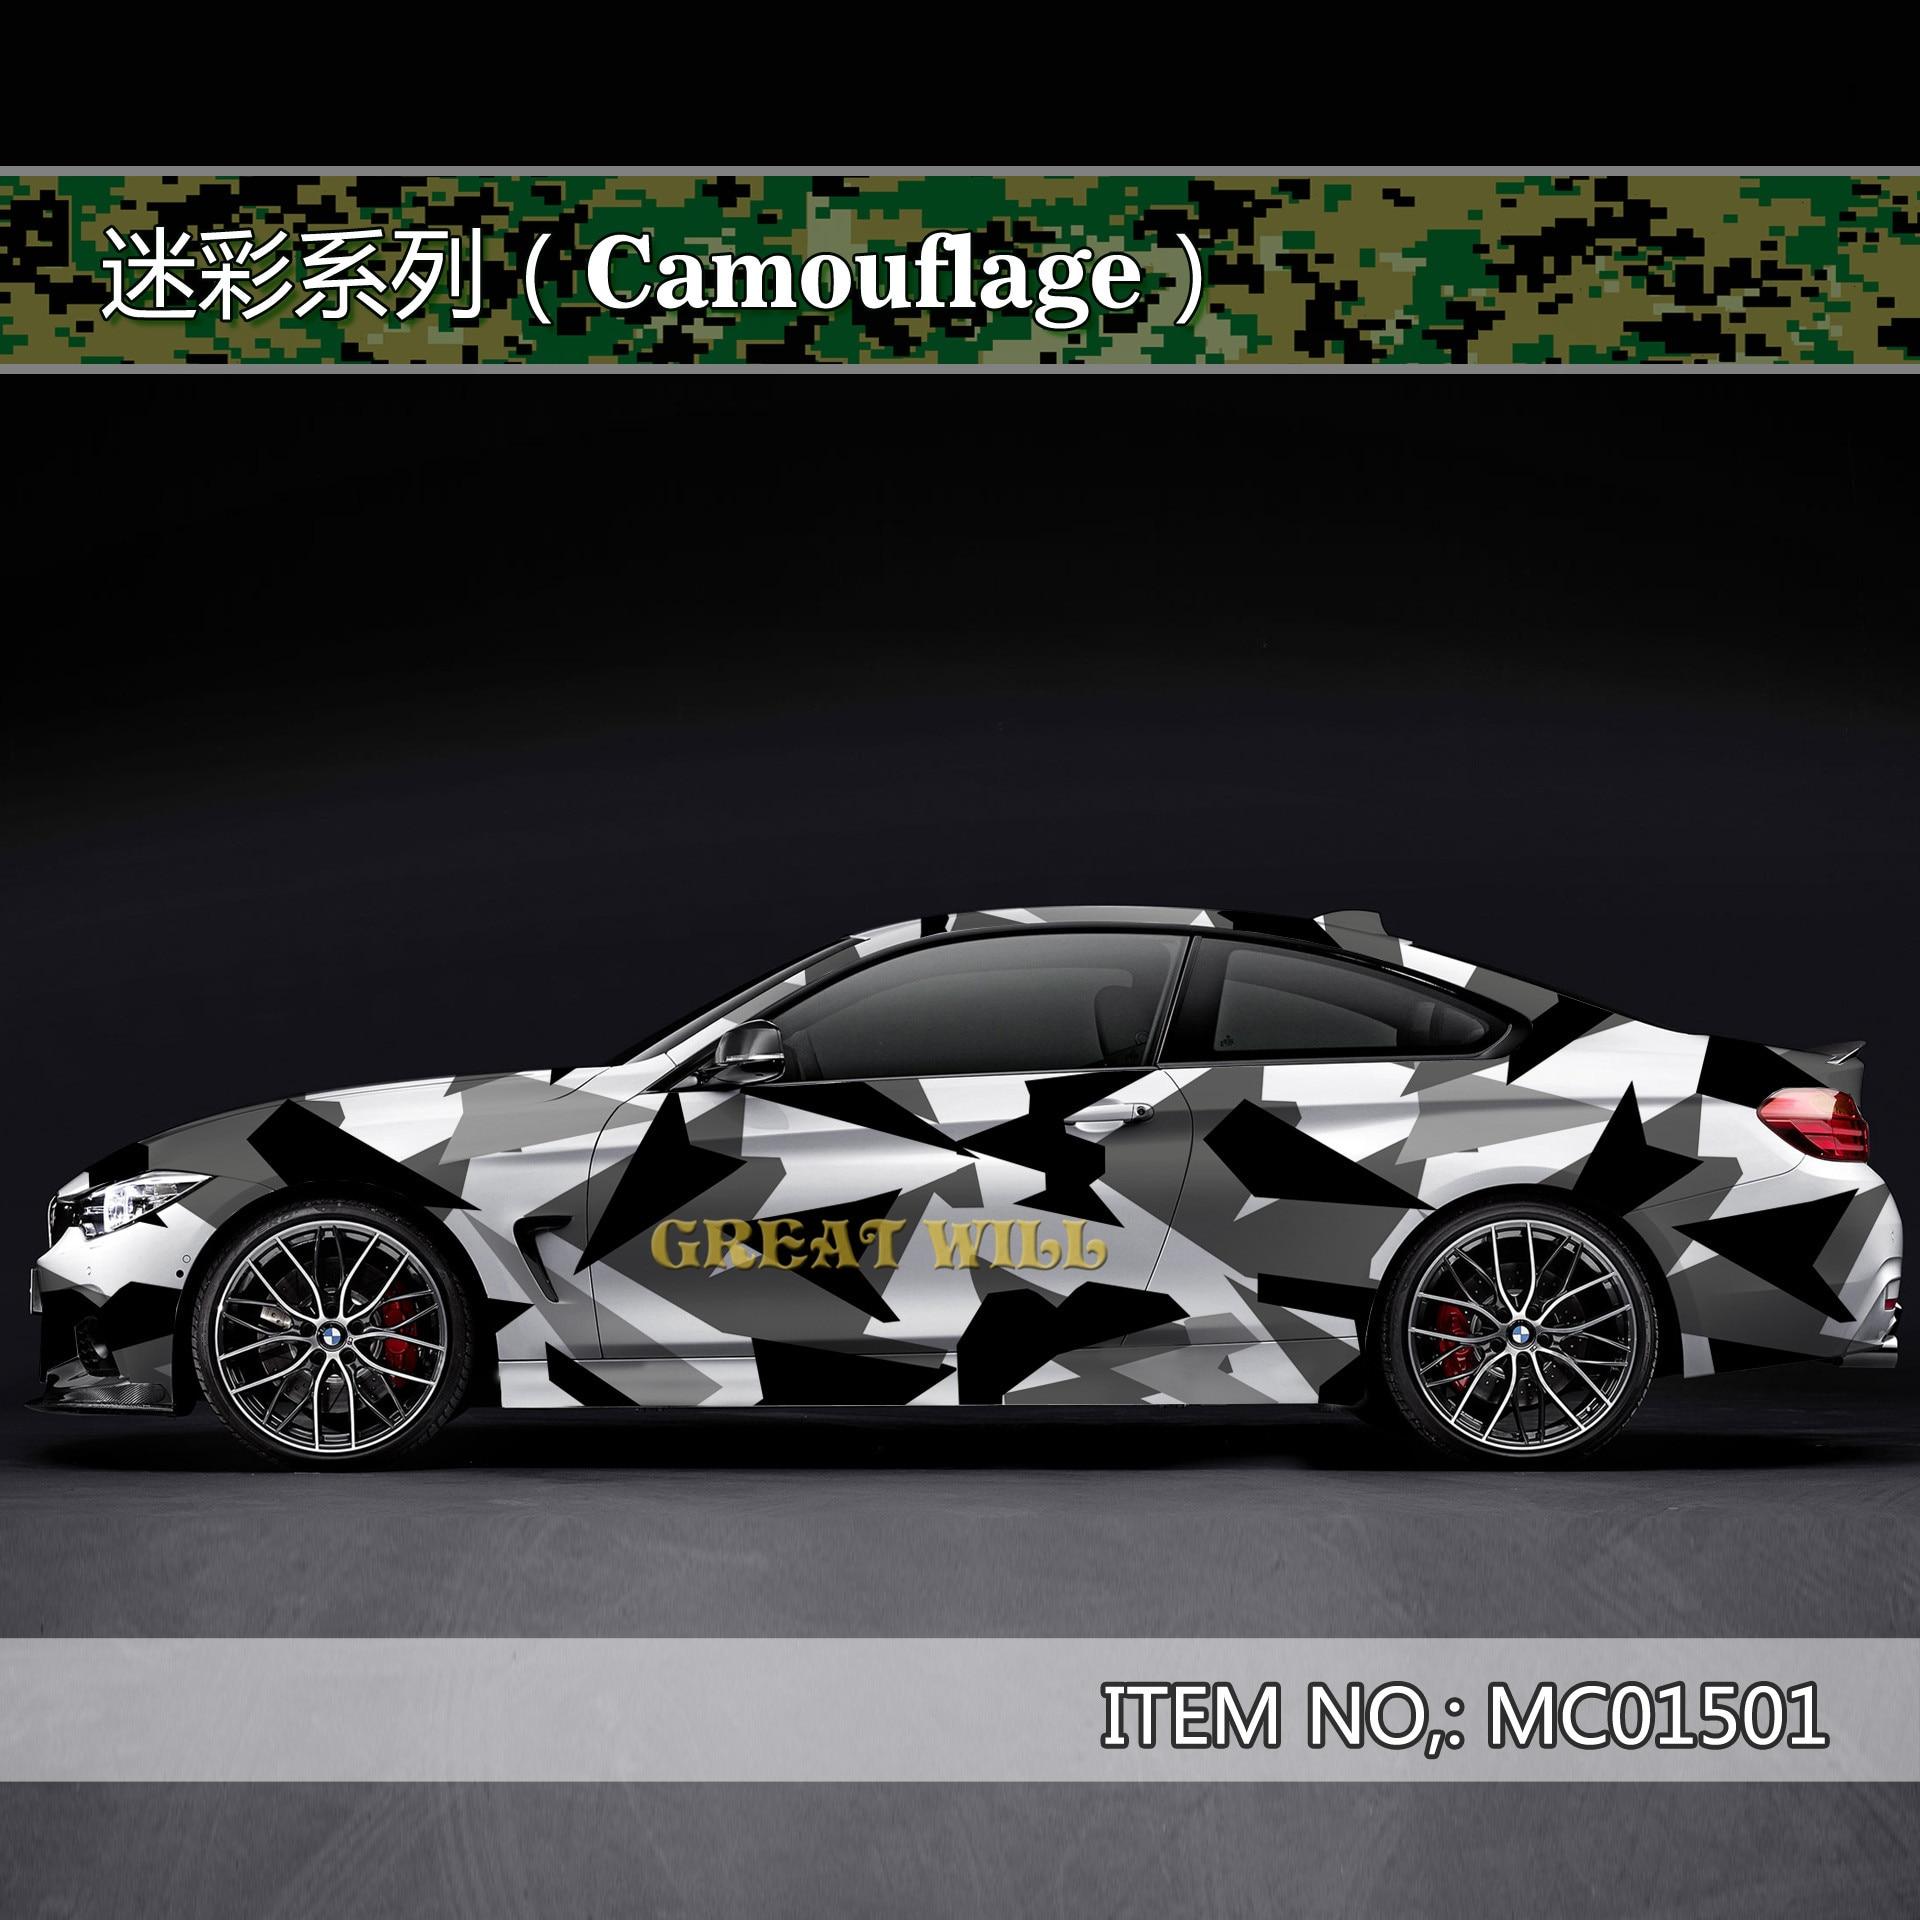 *Premium Green Digital Camouflage Camo Car Vinyl Wrap Sticker Decal Air Release